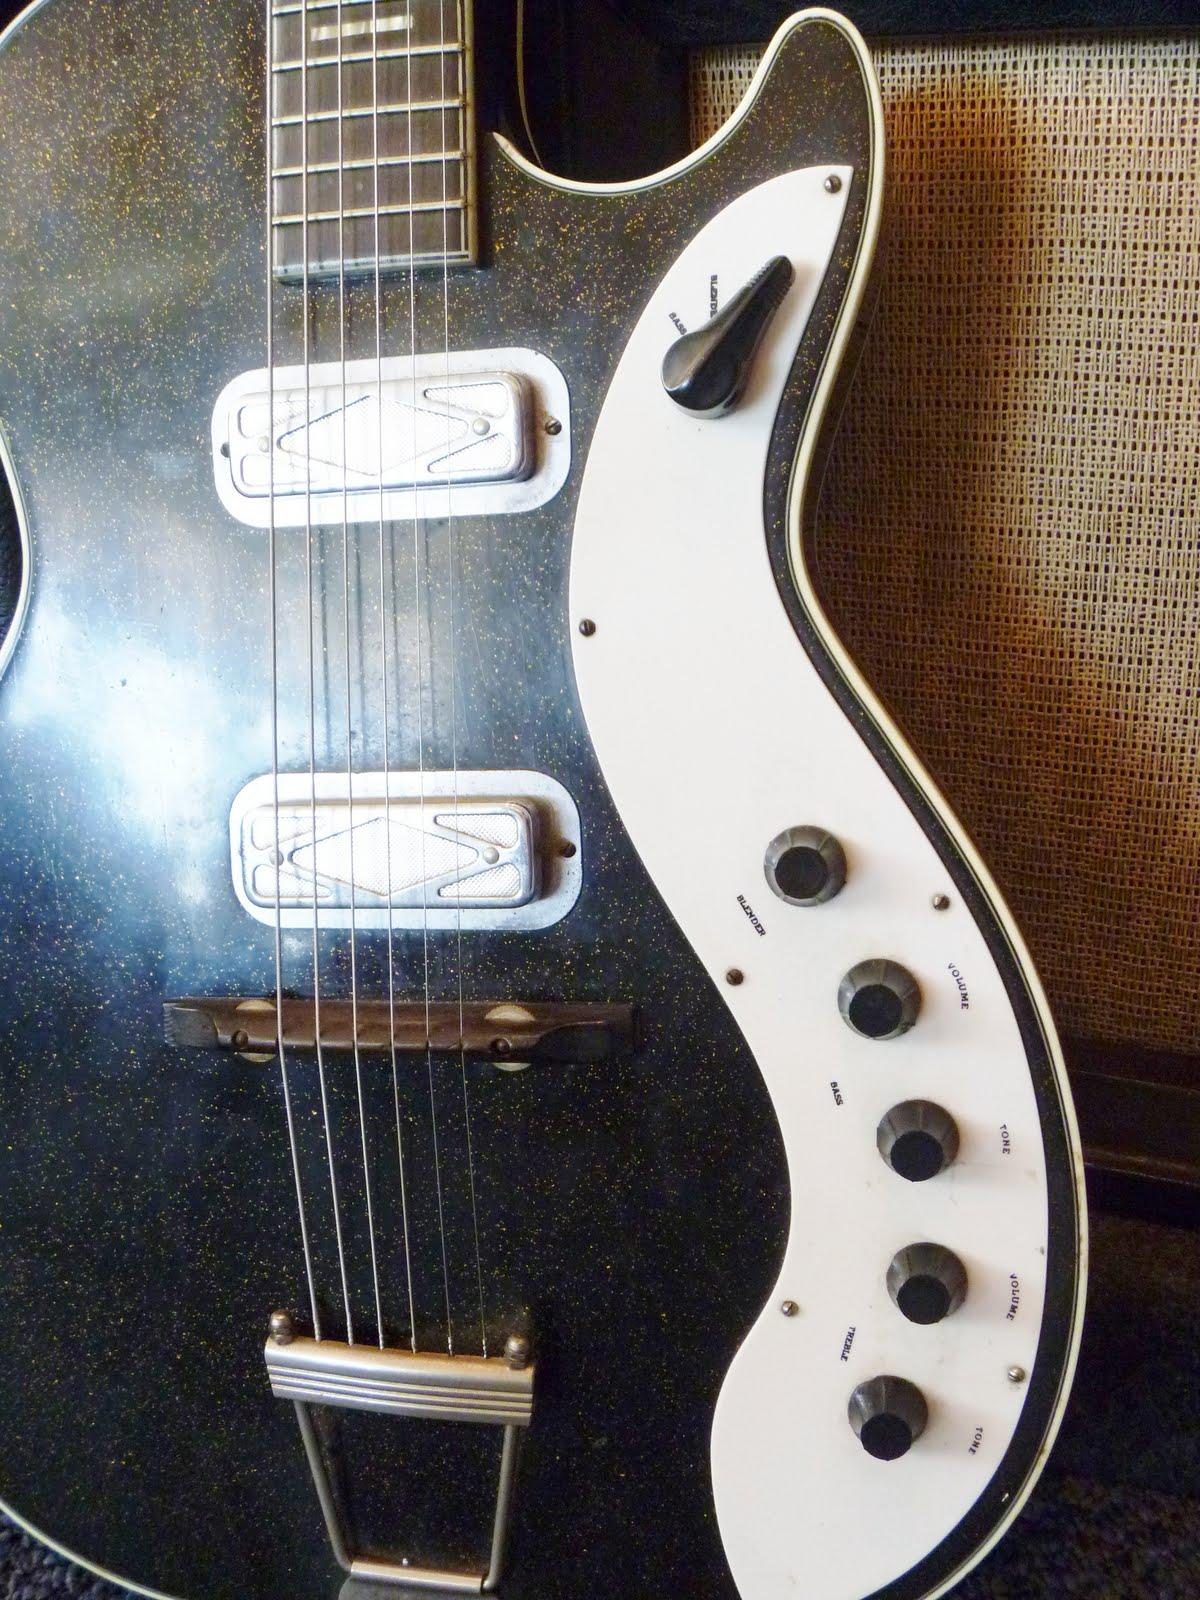 wood wire guitar shop blog silvertone guitar matching amp. Black Bedroom Furniture Sets. Home Design Ideas